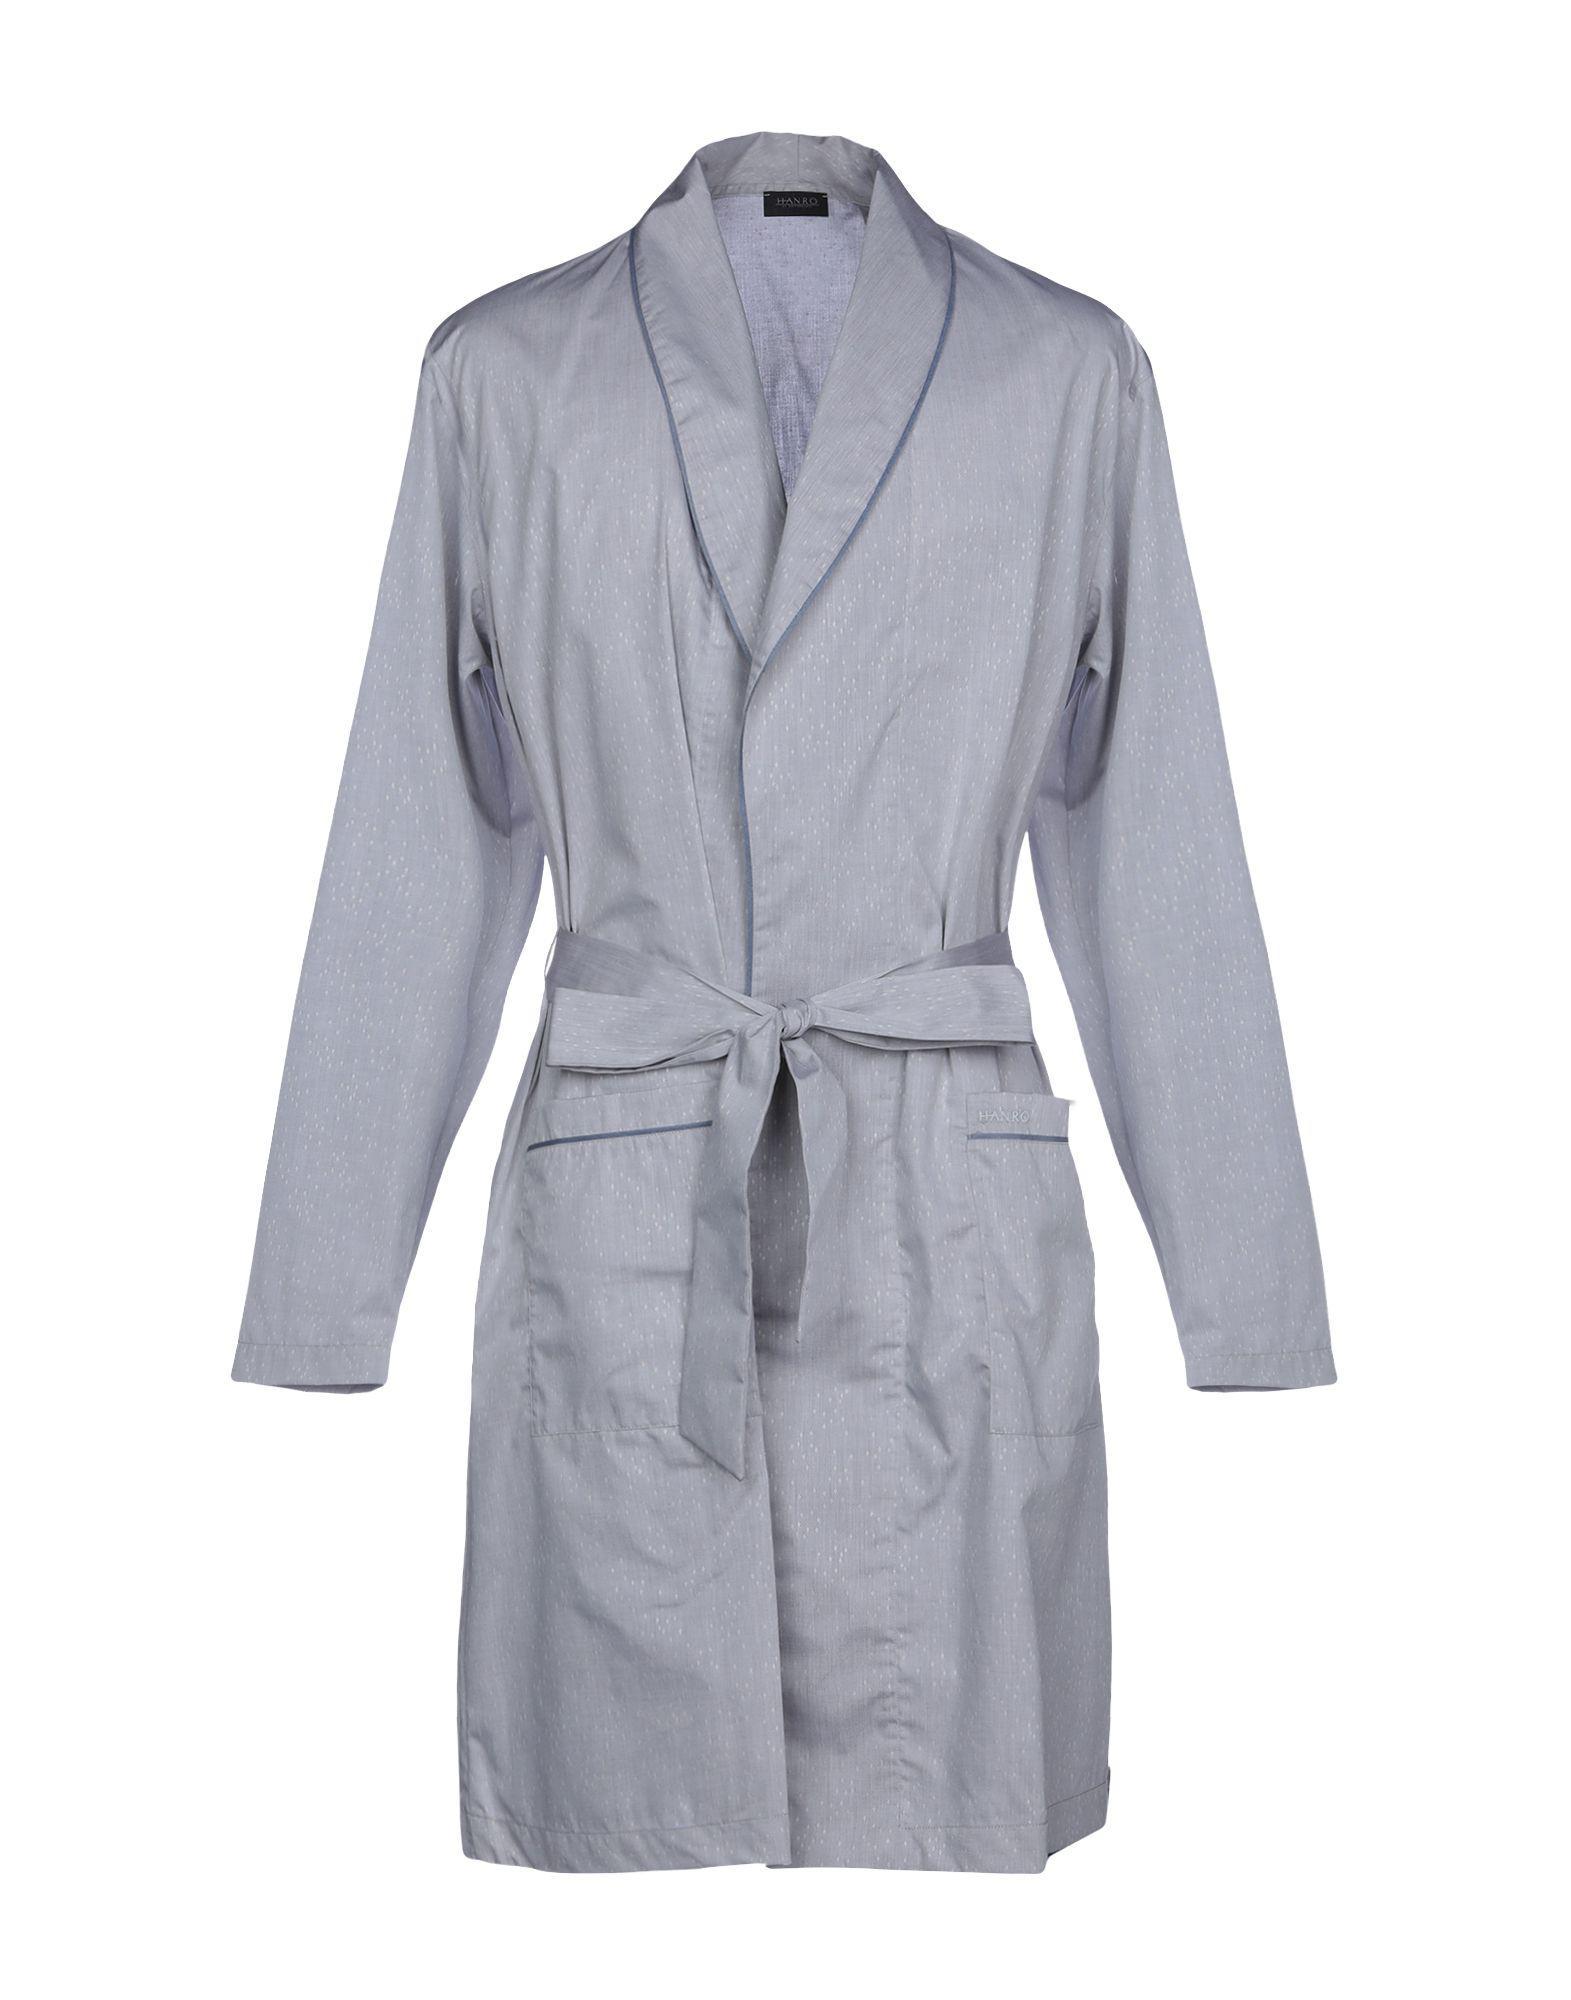 ... Dressing Gown for Men - Lyst. View fullscreen ecaede458